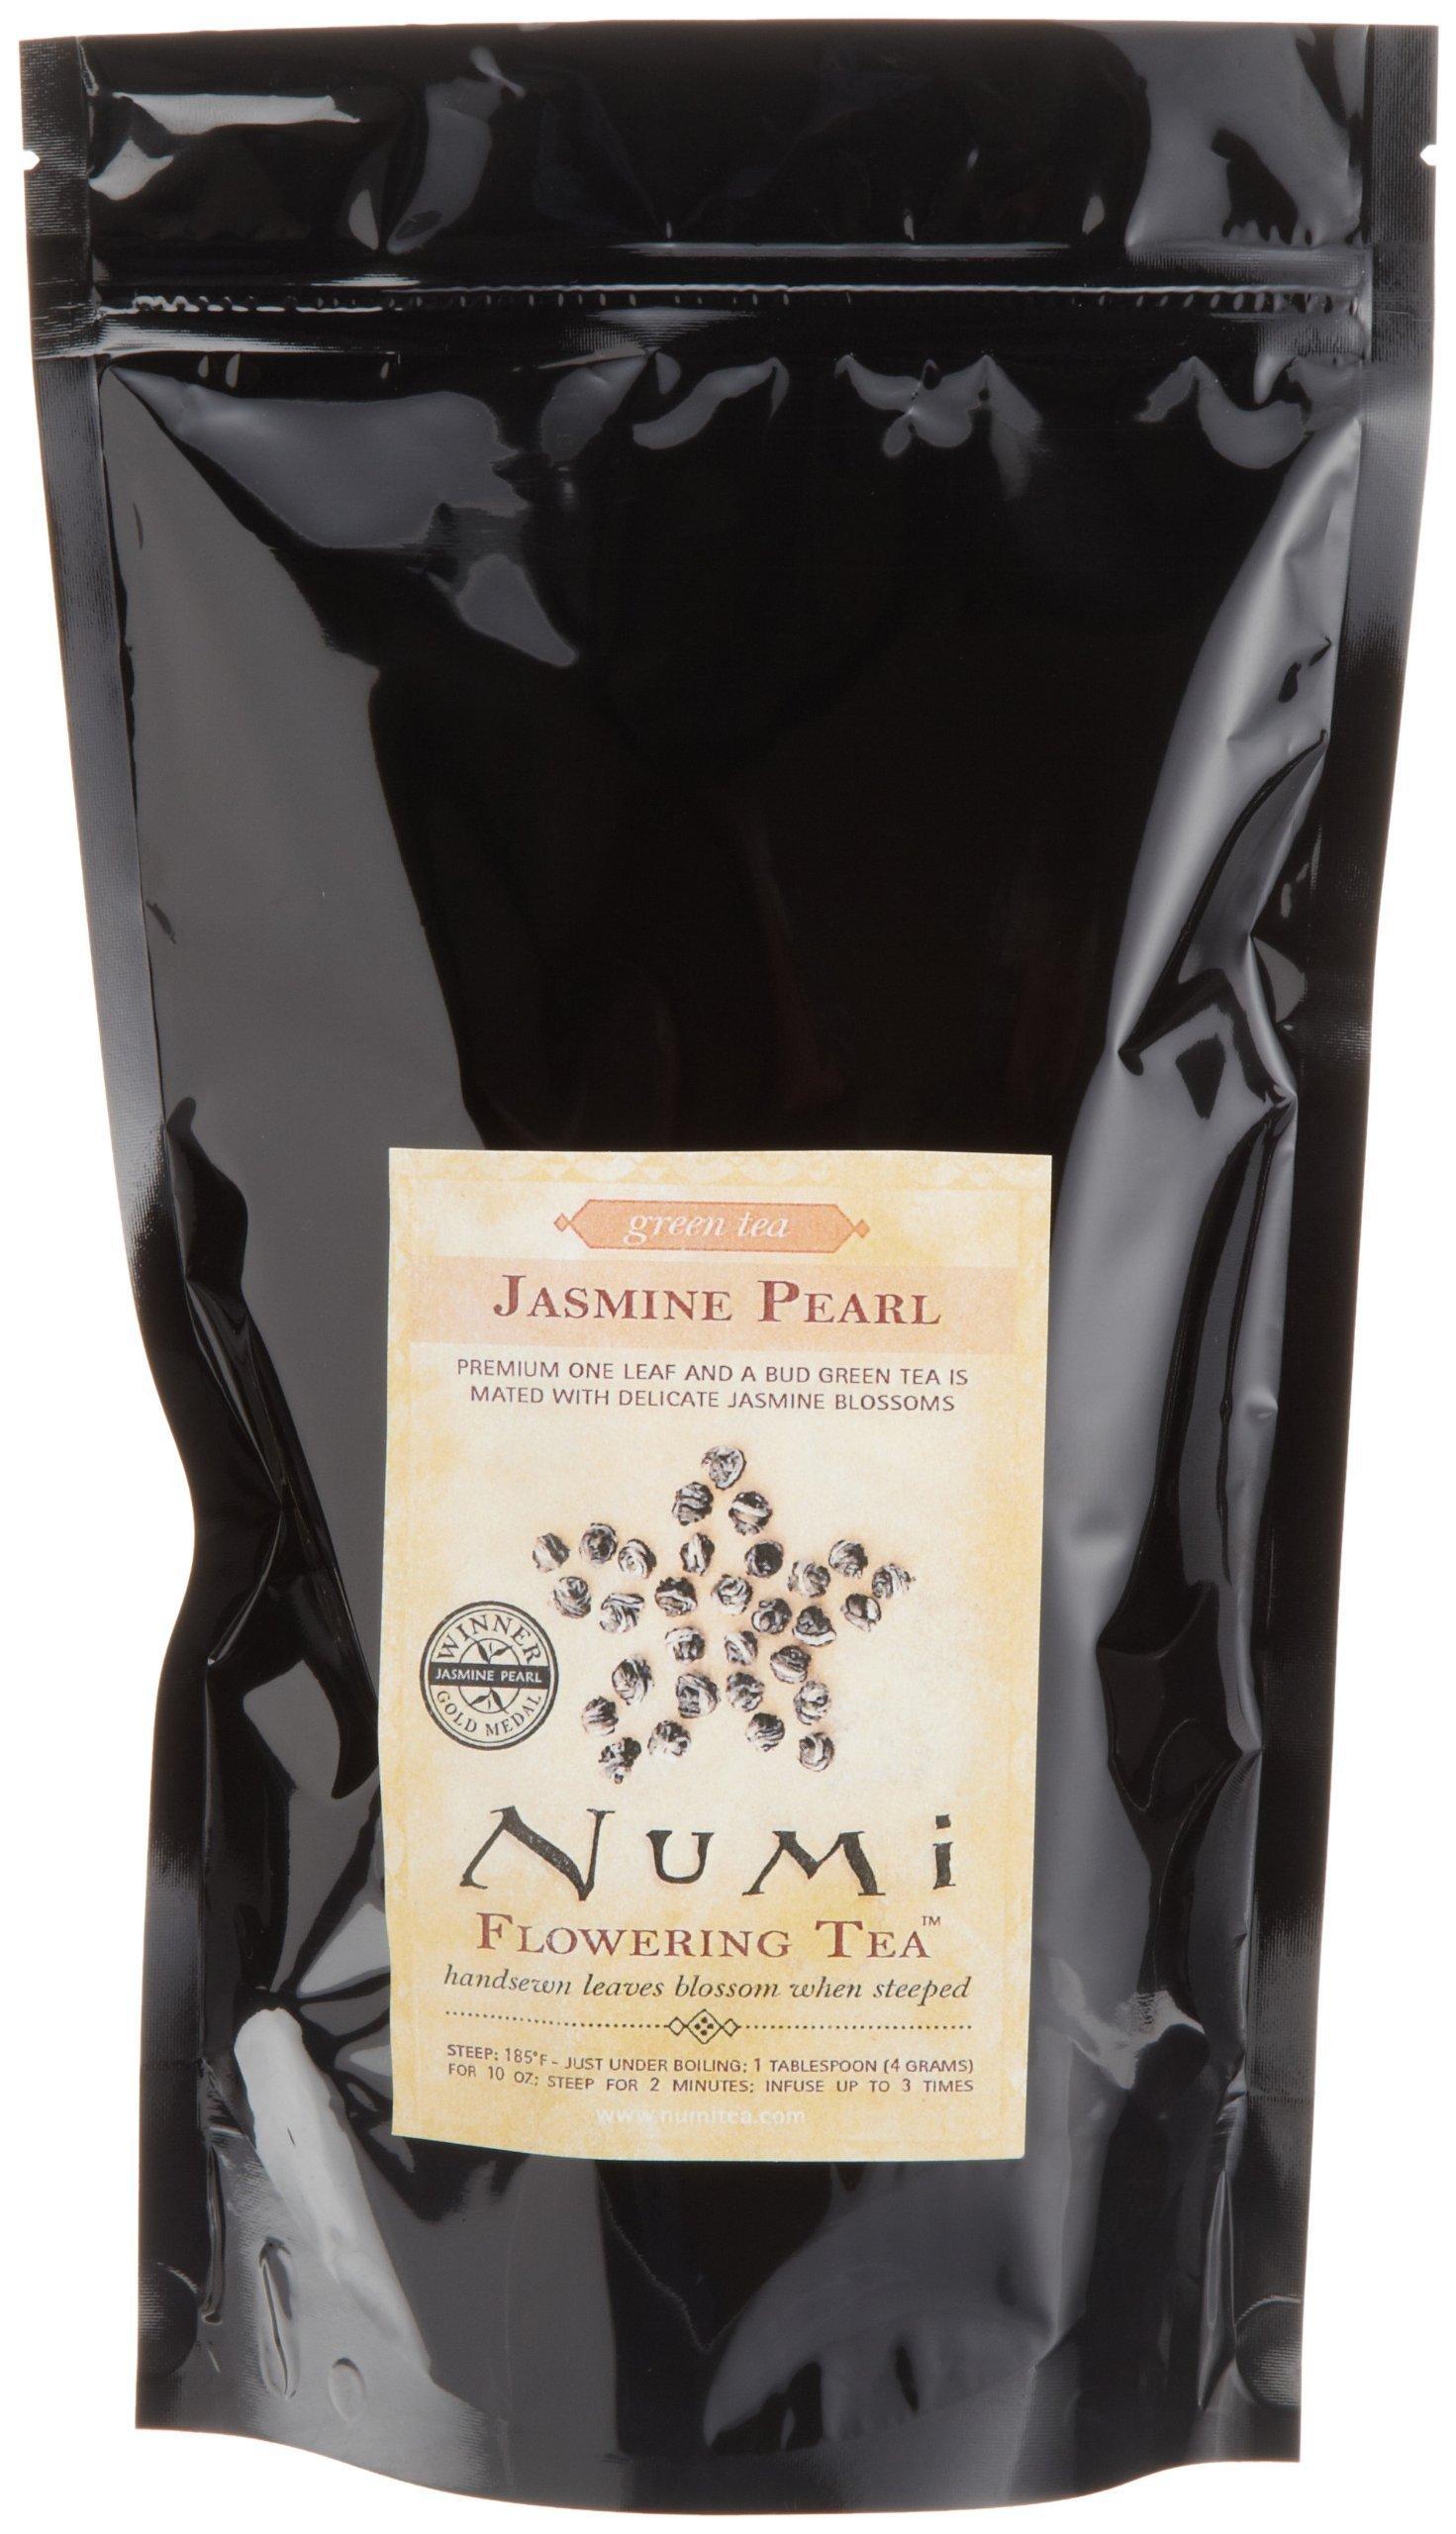 Numi Organic Tea Jasmine Pearls, 16 Ounce Pouch, Loose Leaf Green Tea (Packaging May Vary) by Numi Organic Tea (Image #2)